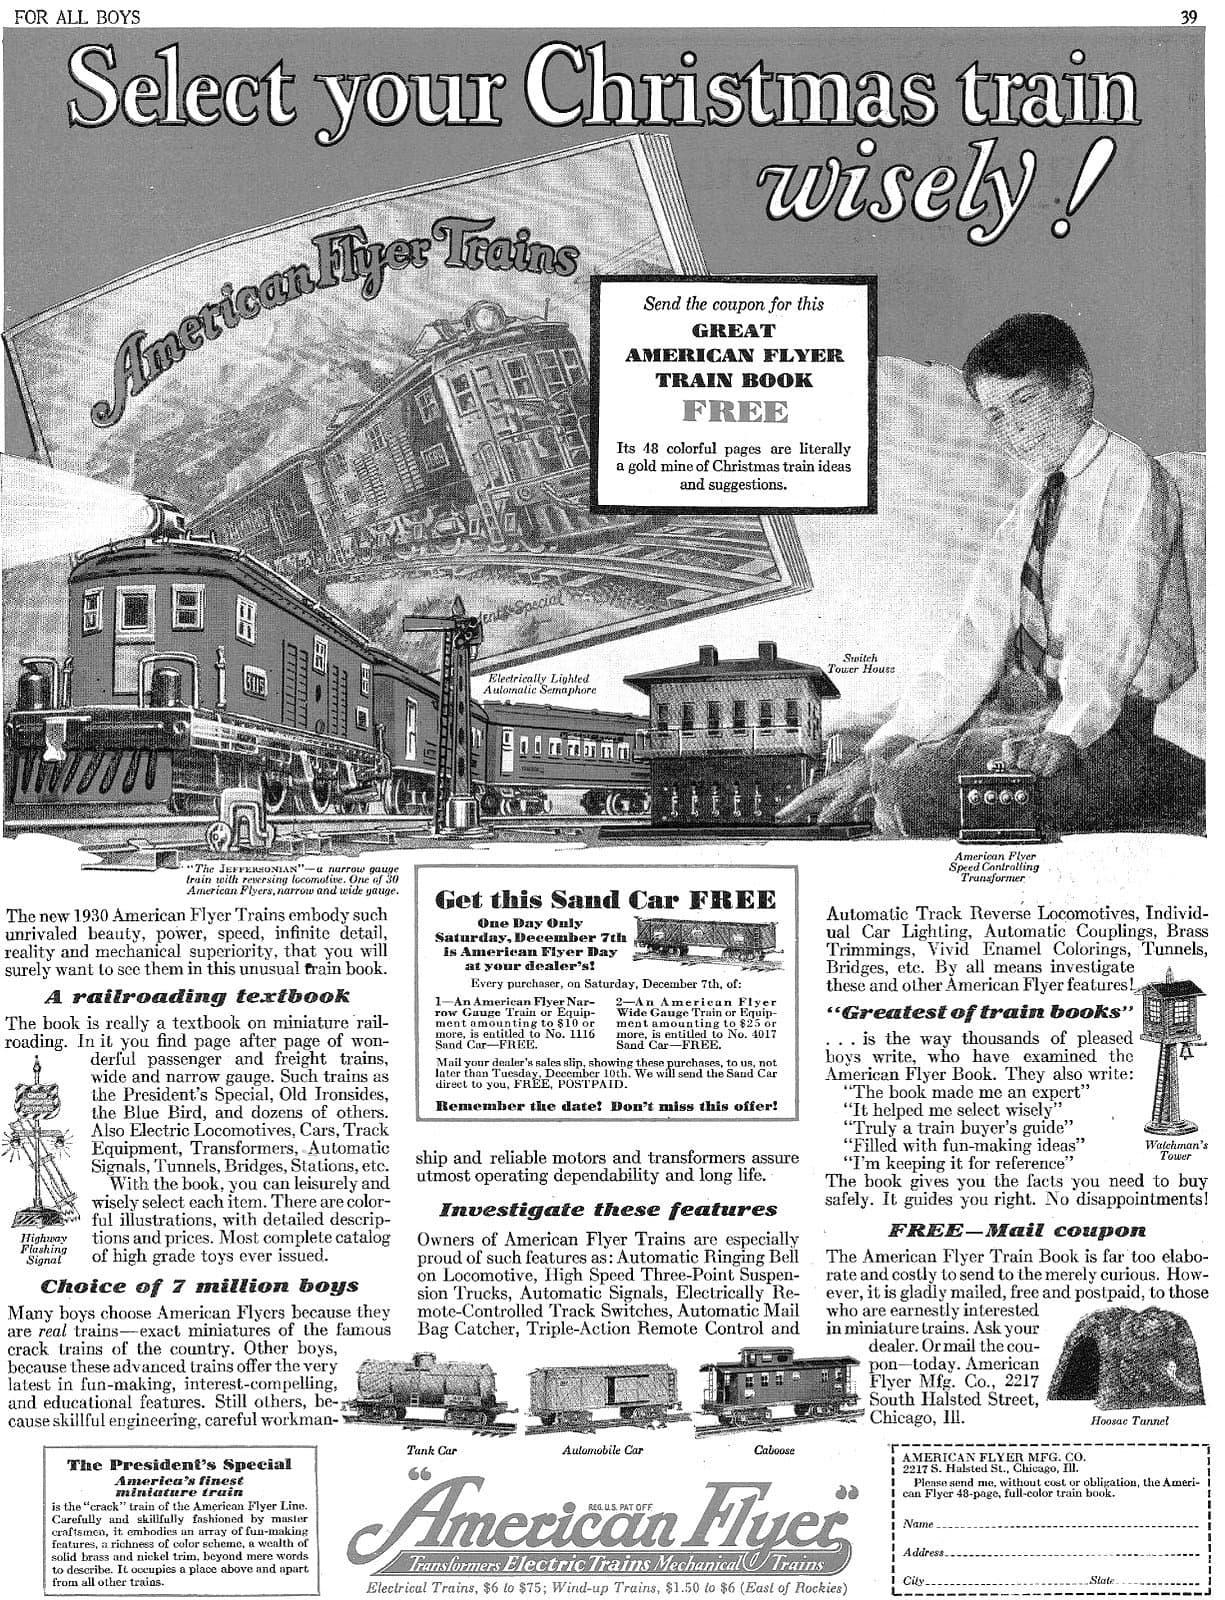 Vintage 1930 American Flyer Trains - Toy railroads